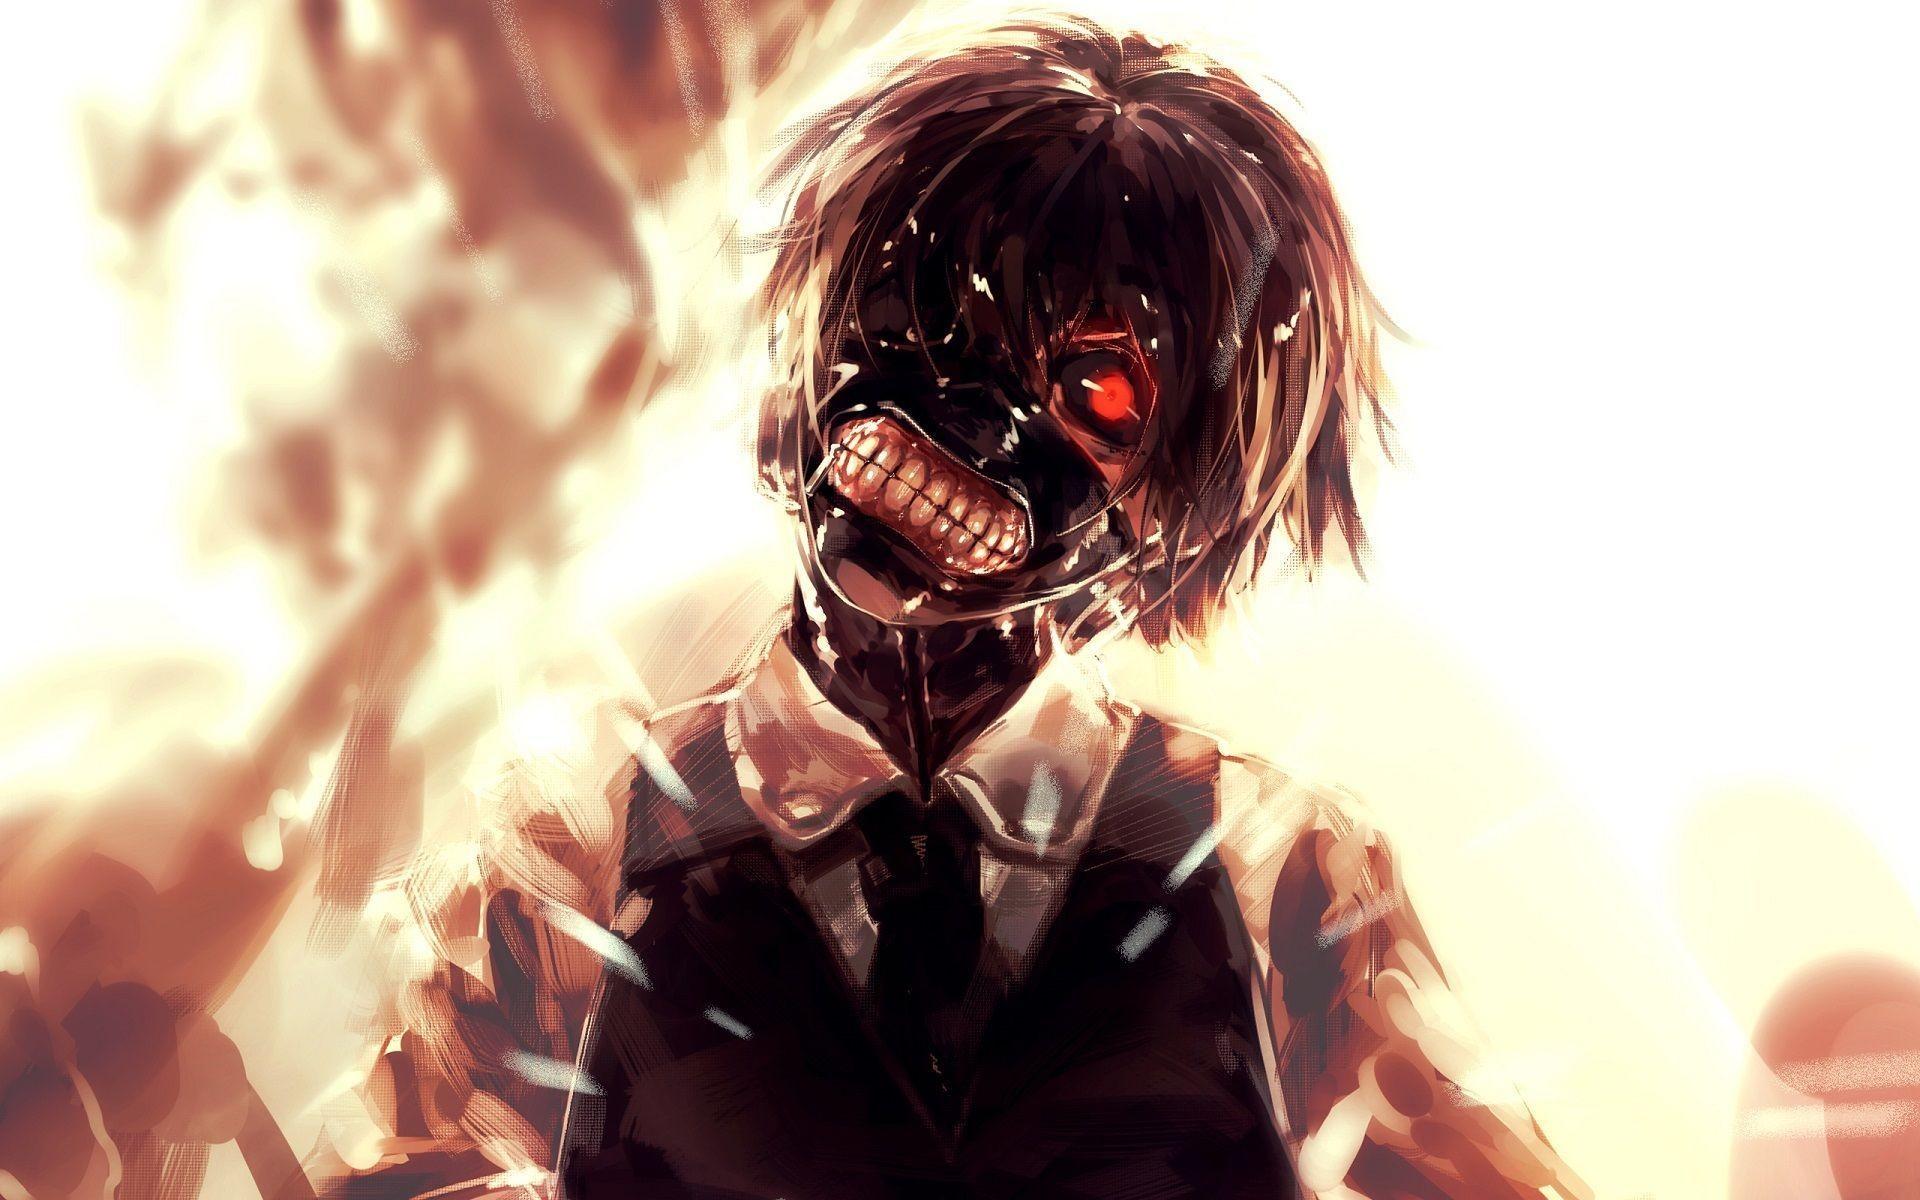 Tokyo Ghoul wallpaper hd free download